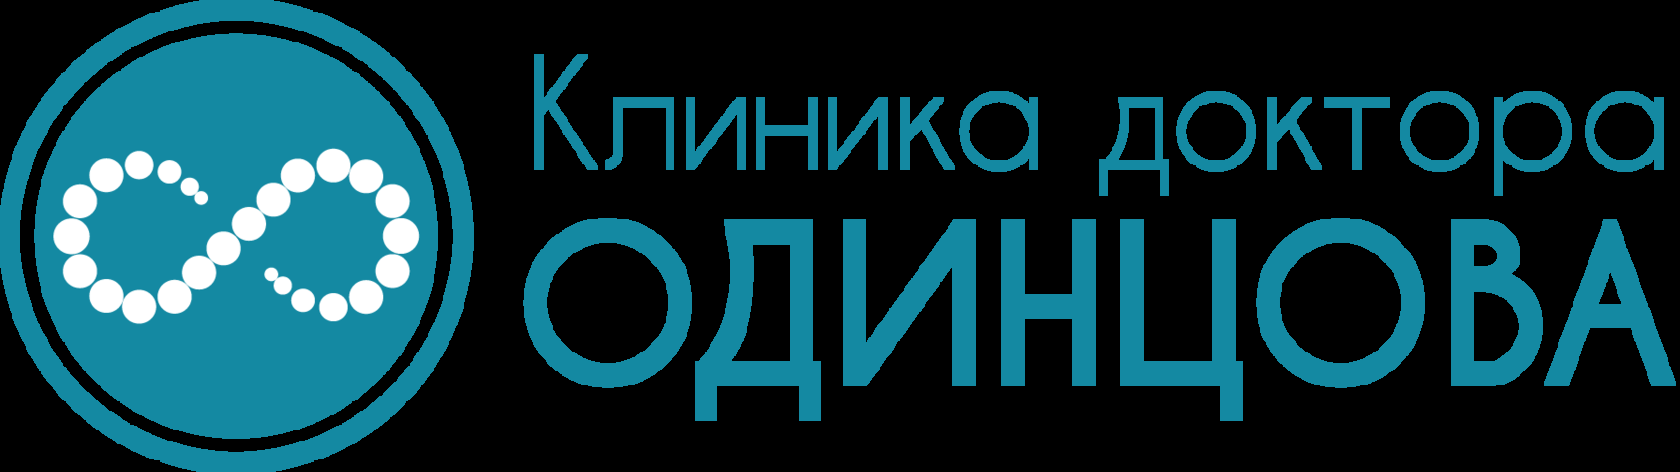 Клиника Одинцова